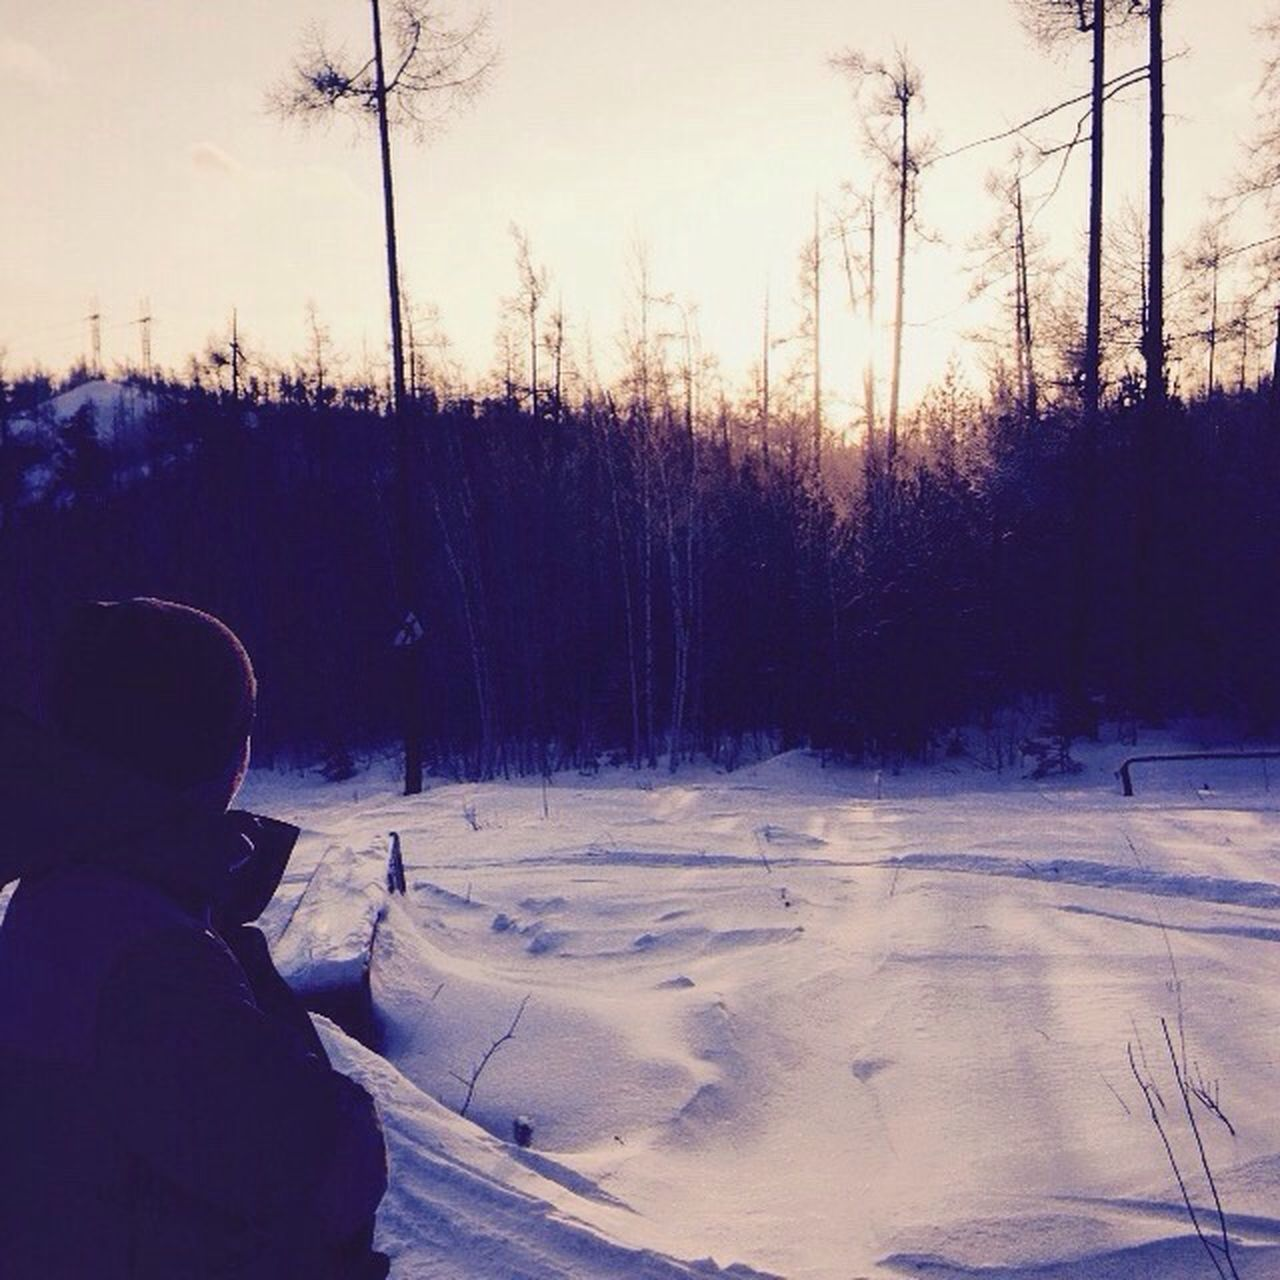 катнули сноуборд